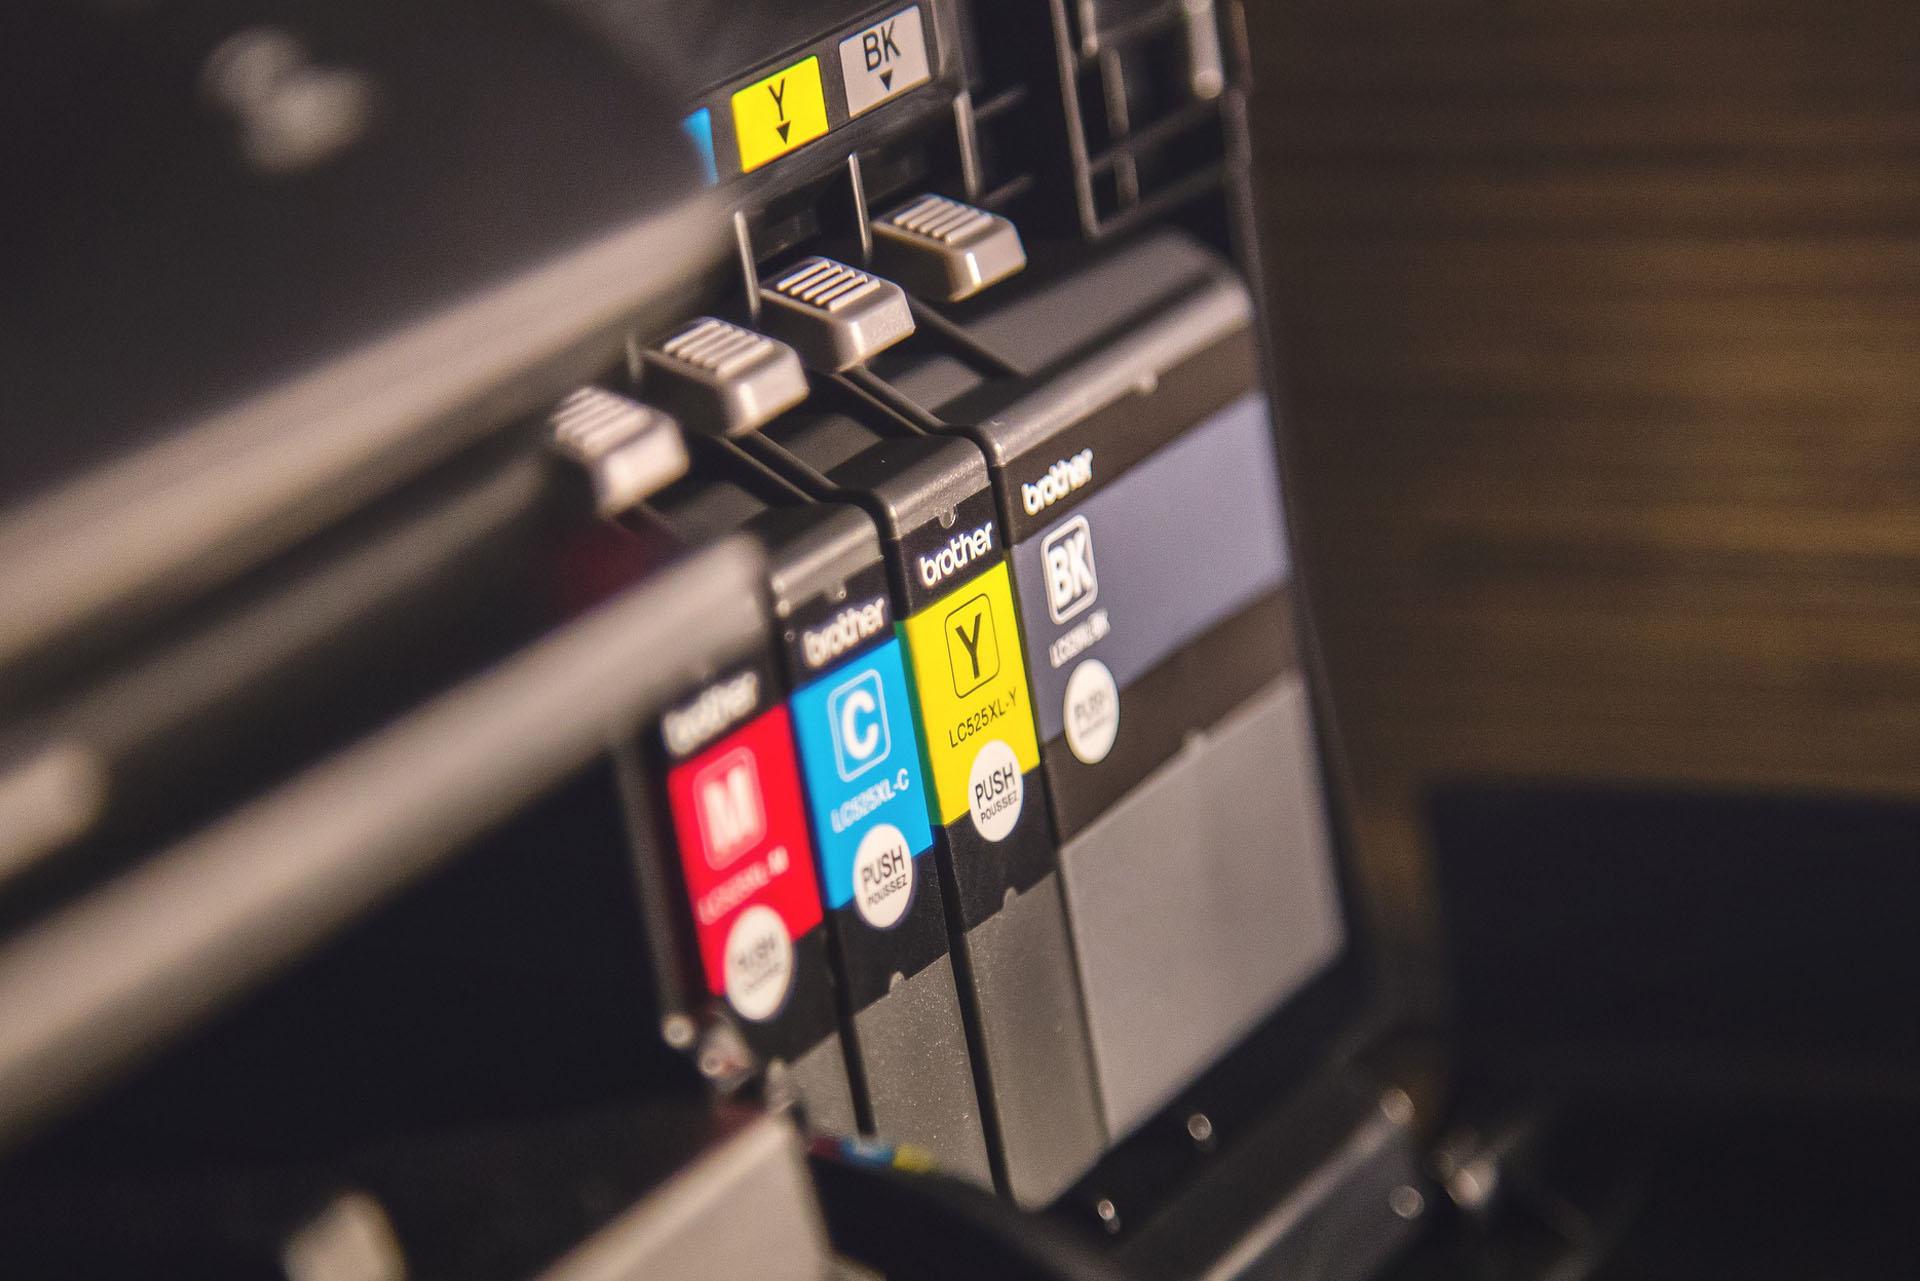 stampanti-multiax-italia-riparazione-stampanti